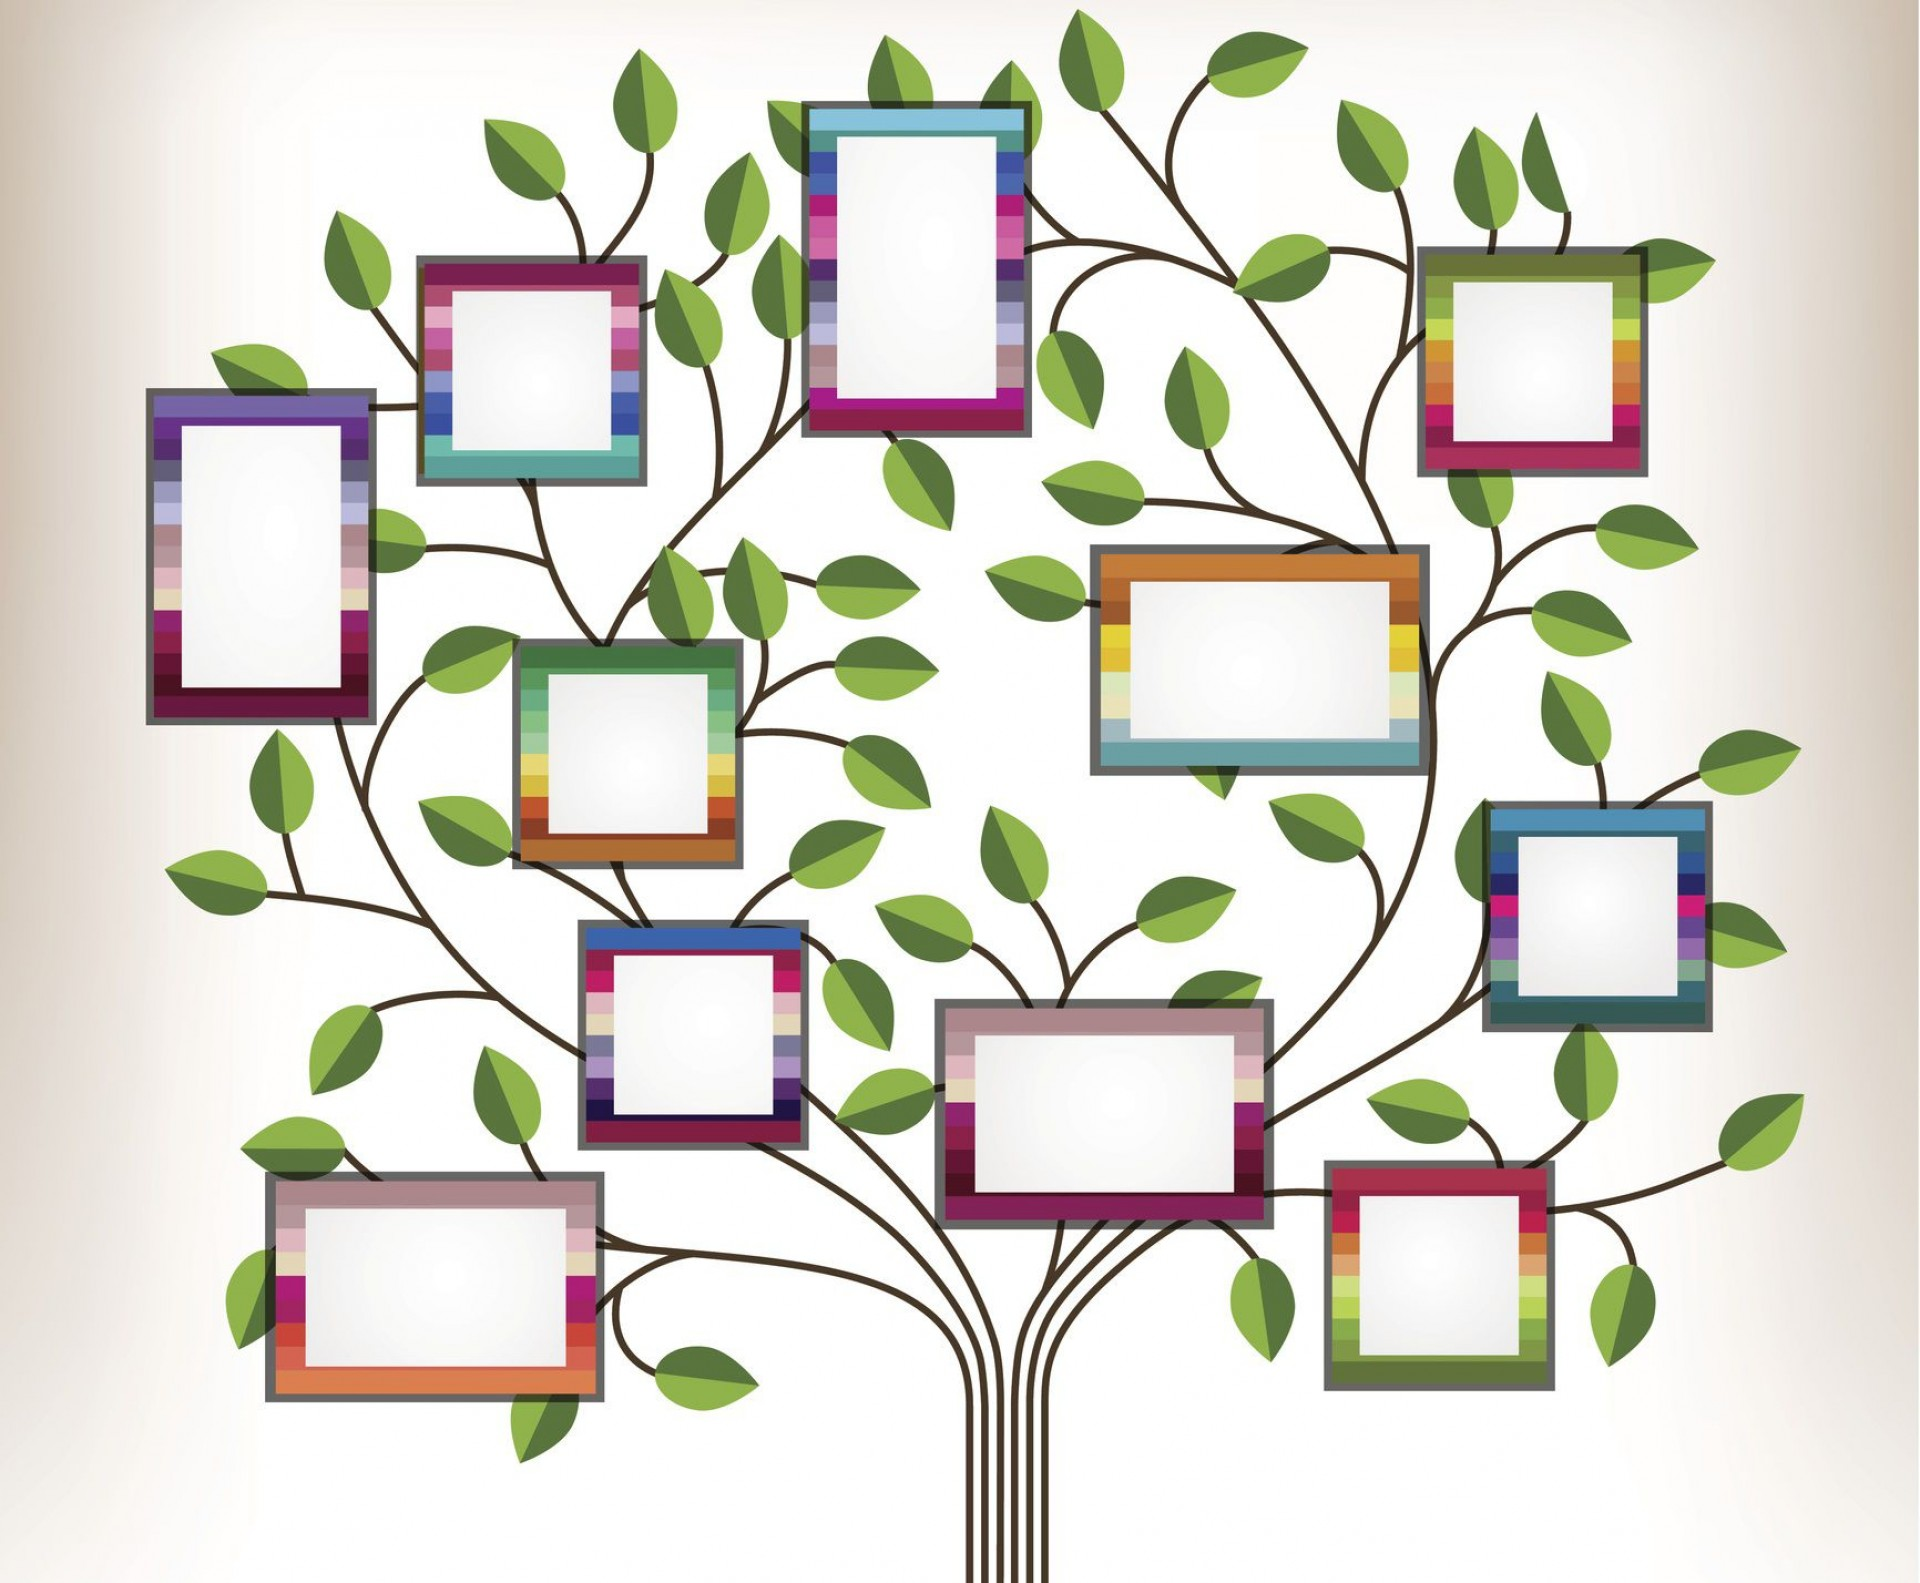 005 Sensational Family Tree For Baby Book Template Inspiration  Printable1920